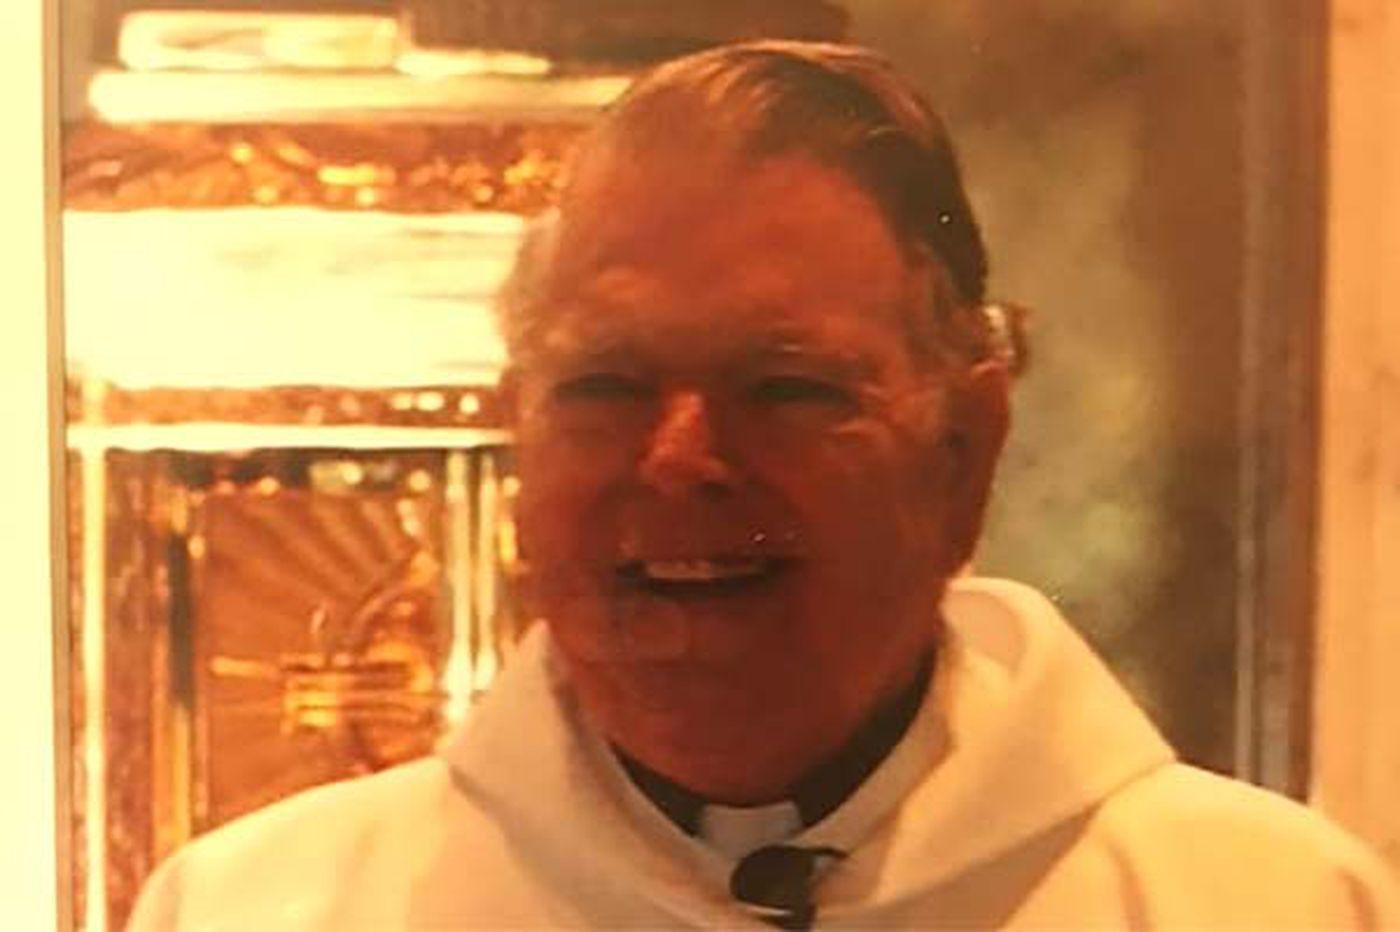 James J. Ambrogi, 80, Catholic priest